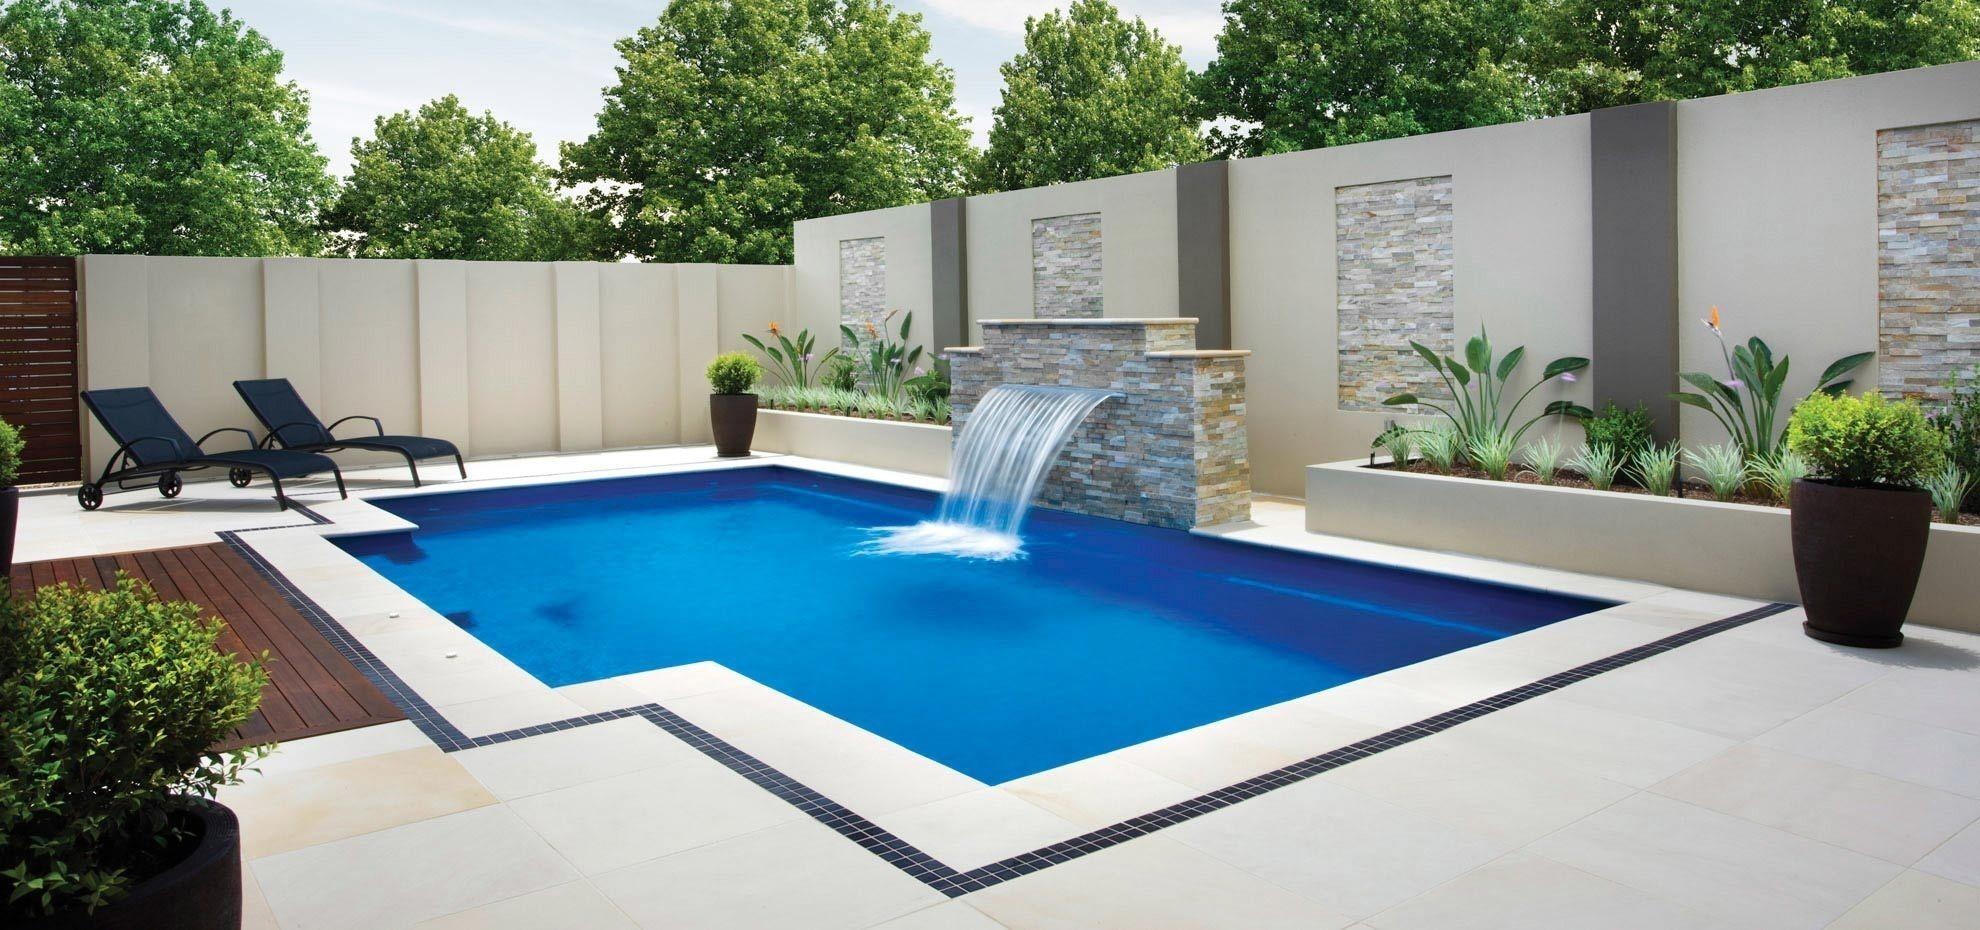 Inspirational Pool Landscaping Ideas Australia CN21vu  Backyard